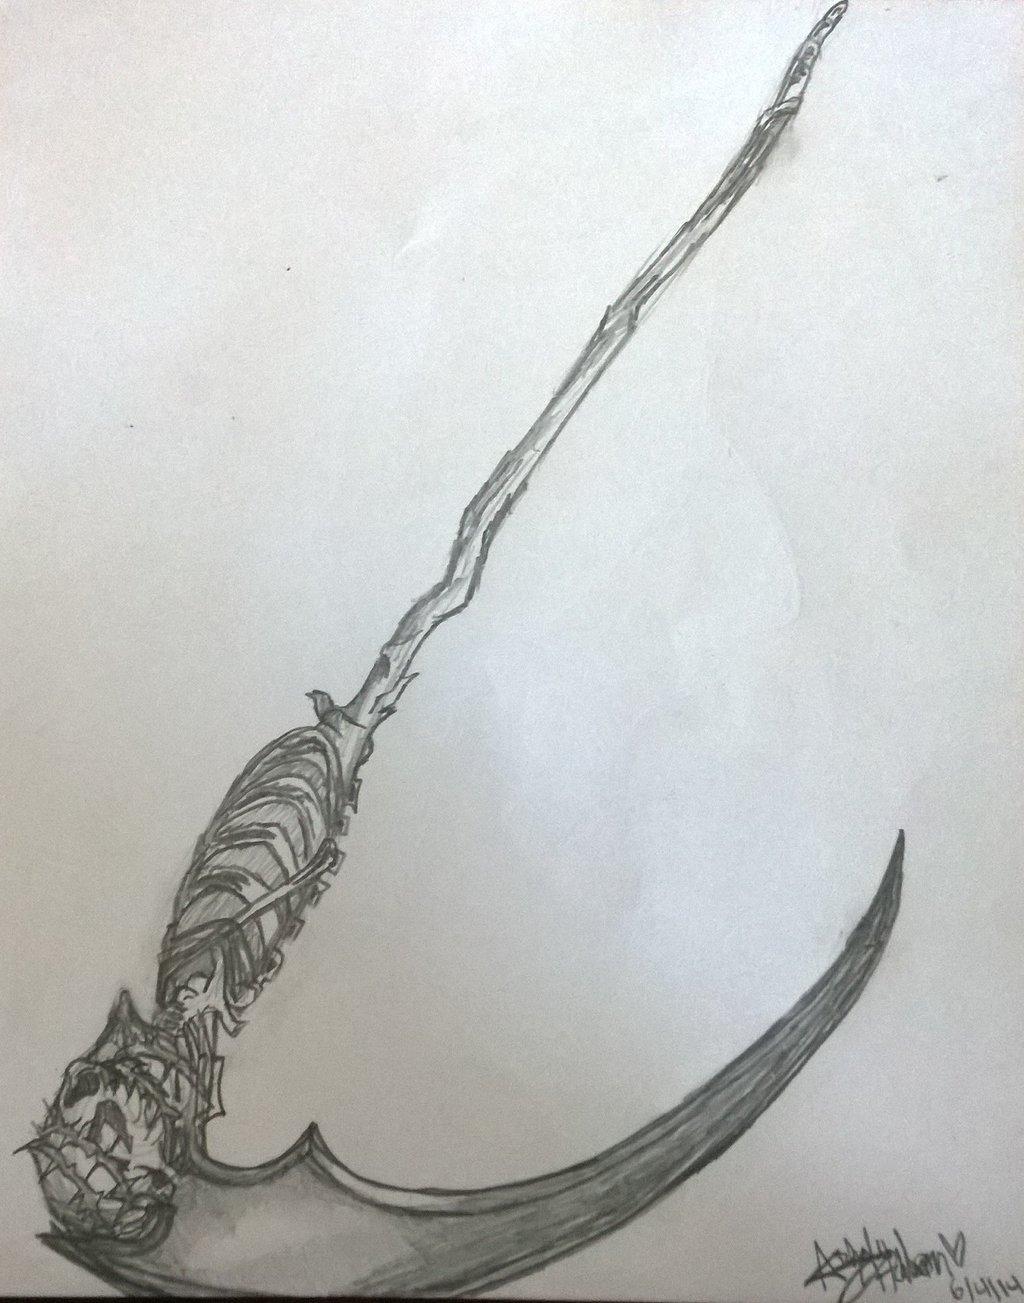 Drawn scythe undertaker On Death Undertaker's LillianDrakos Scythe